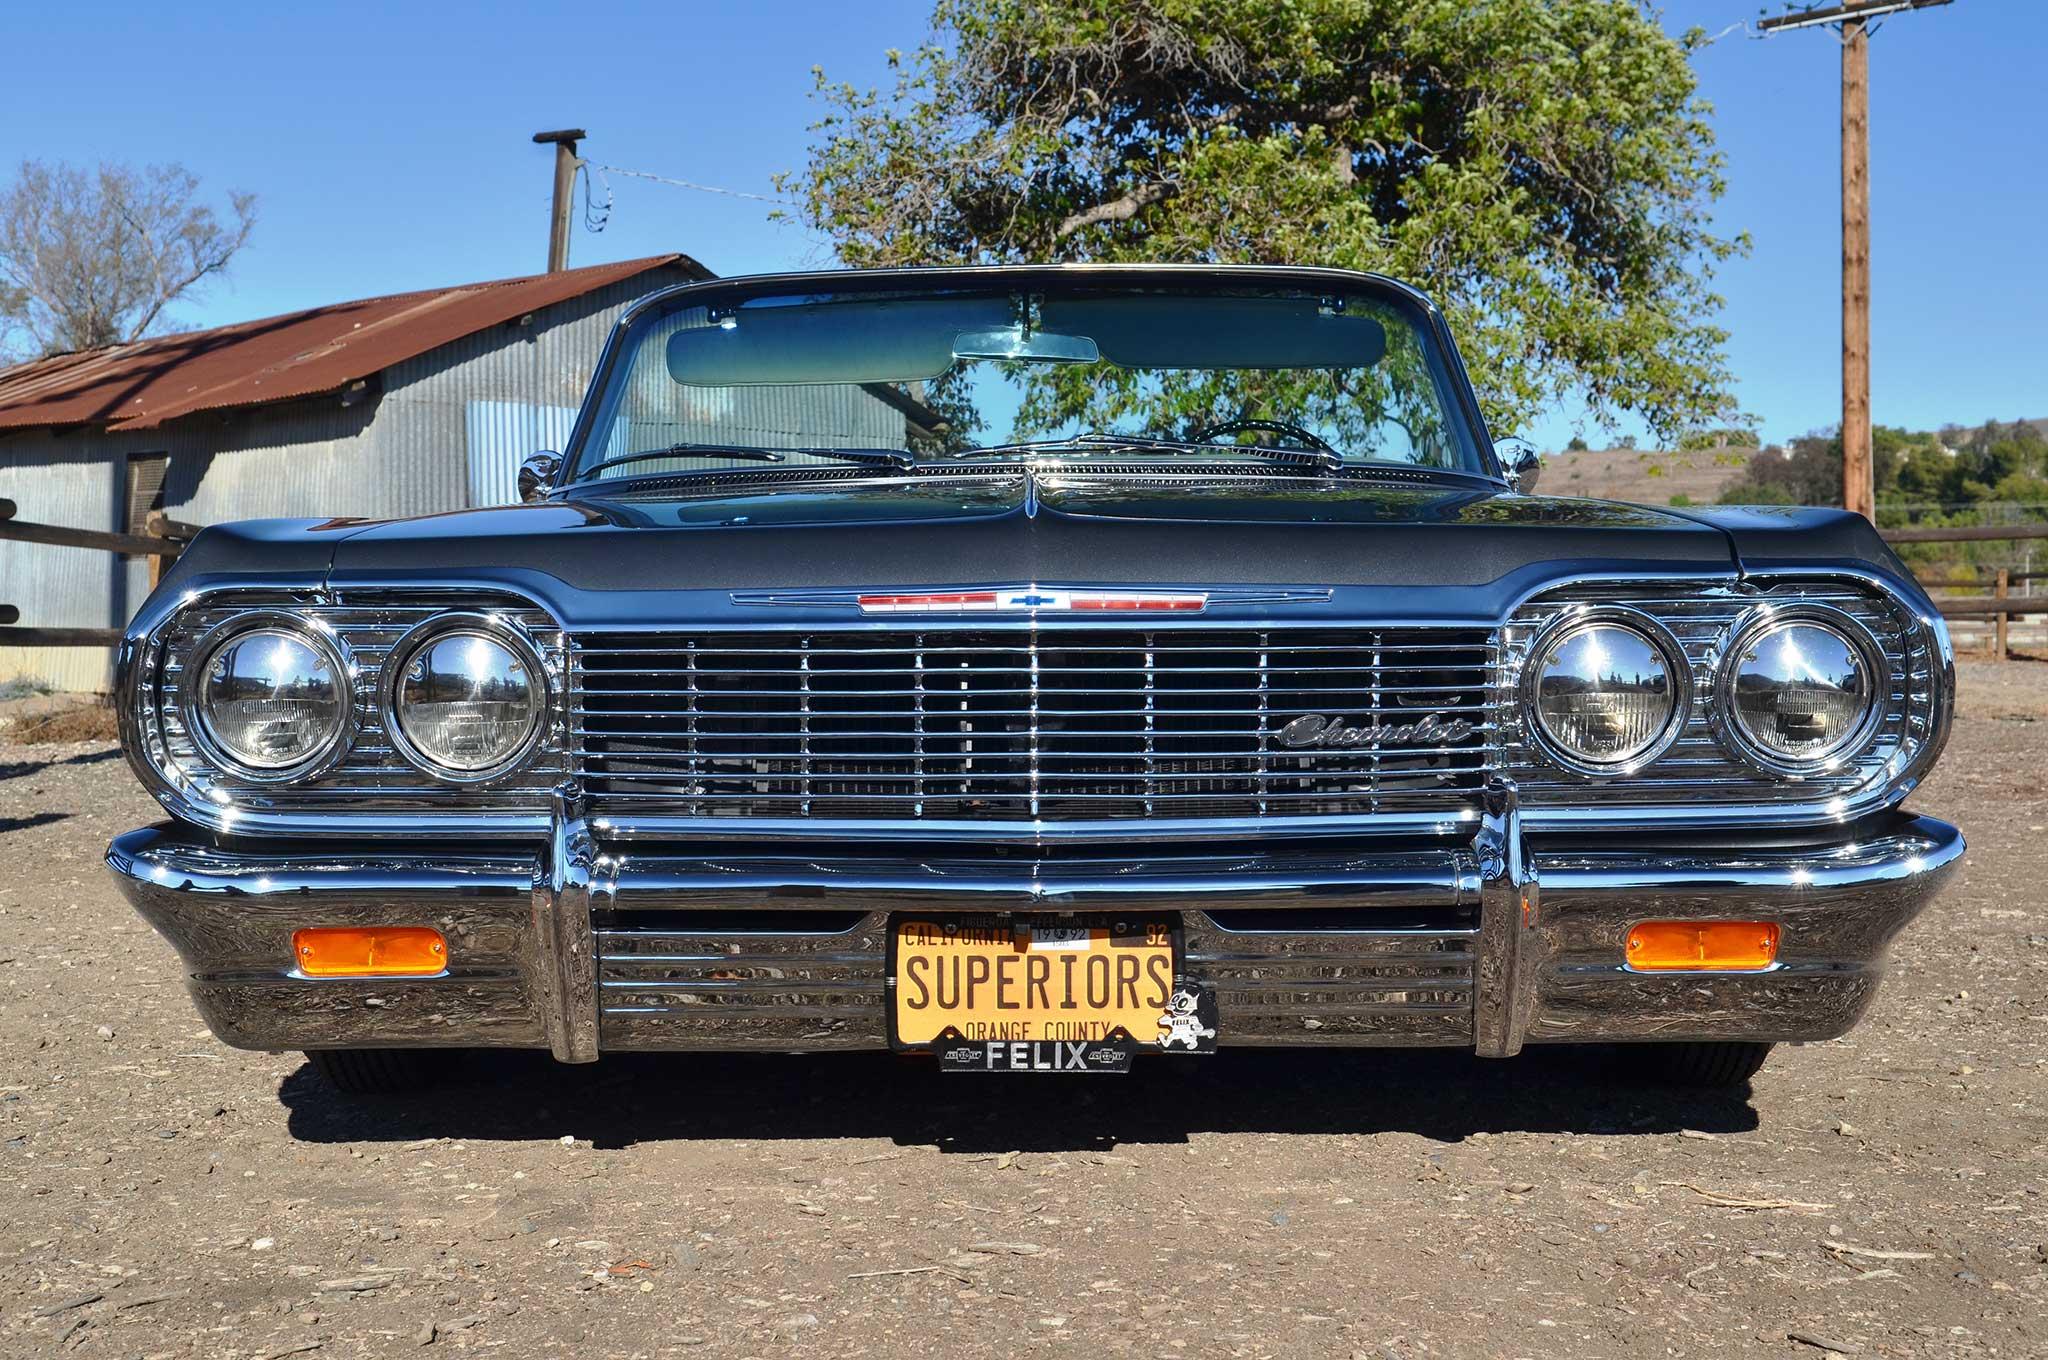 rebuilding a 1964 chevrolet impala ss convertible. Black Bedroom Furniture Sets. Home Design Ideas